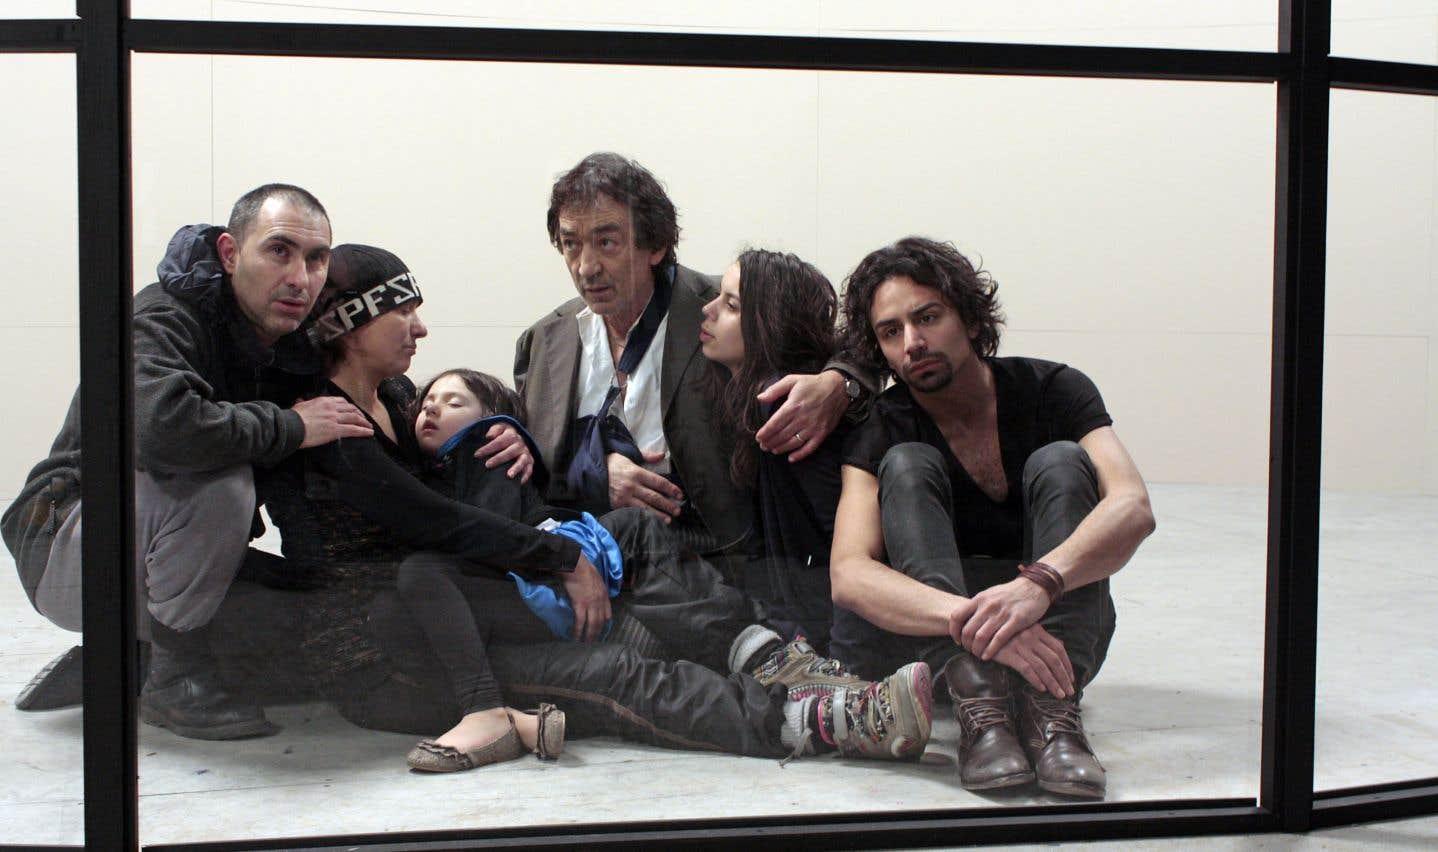 Chto Delat, Museum Songspiel, Image fixe, 2011